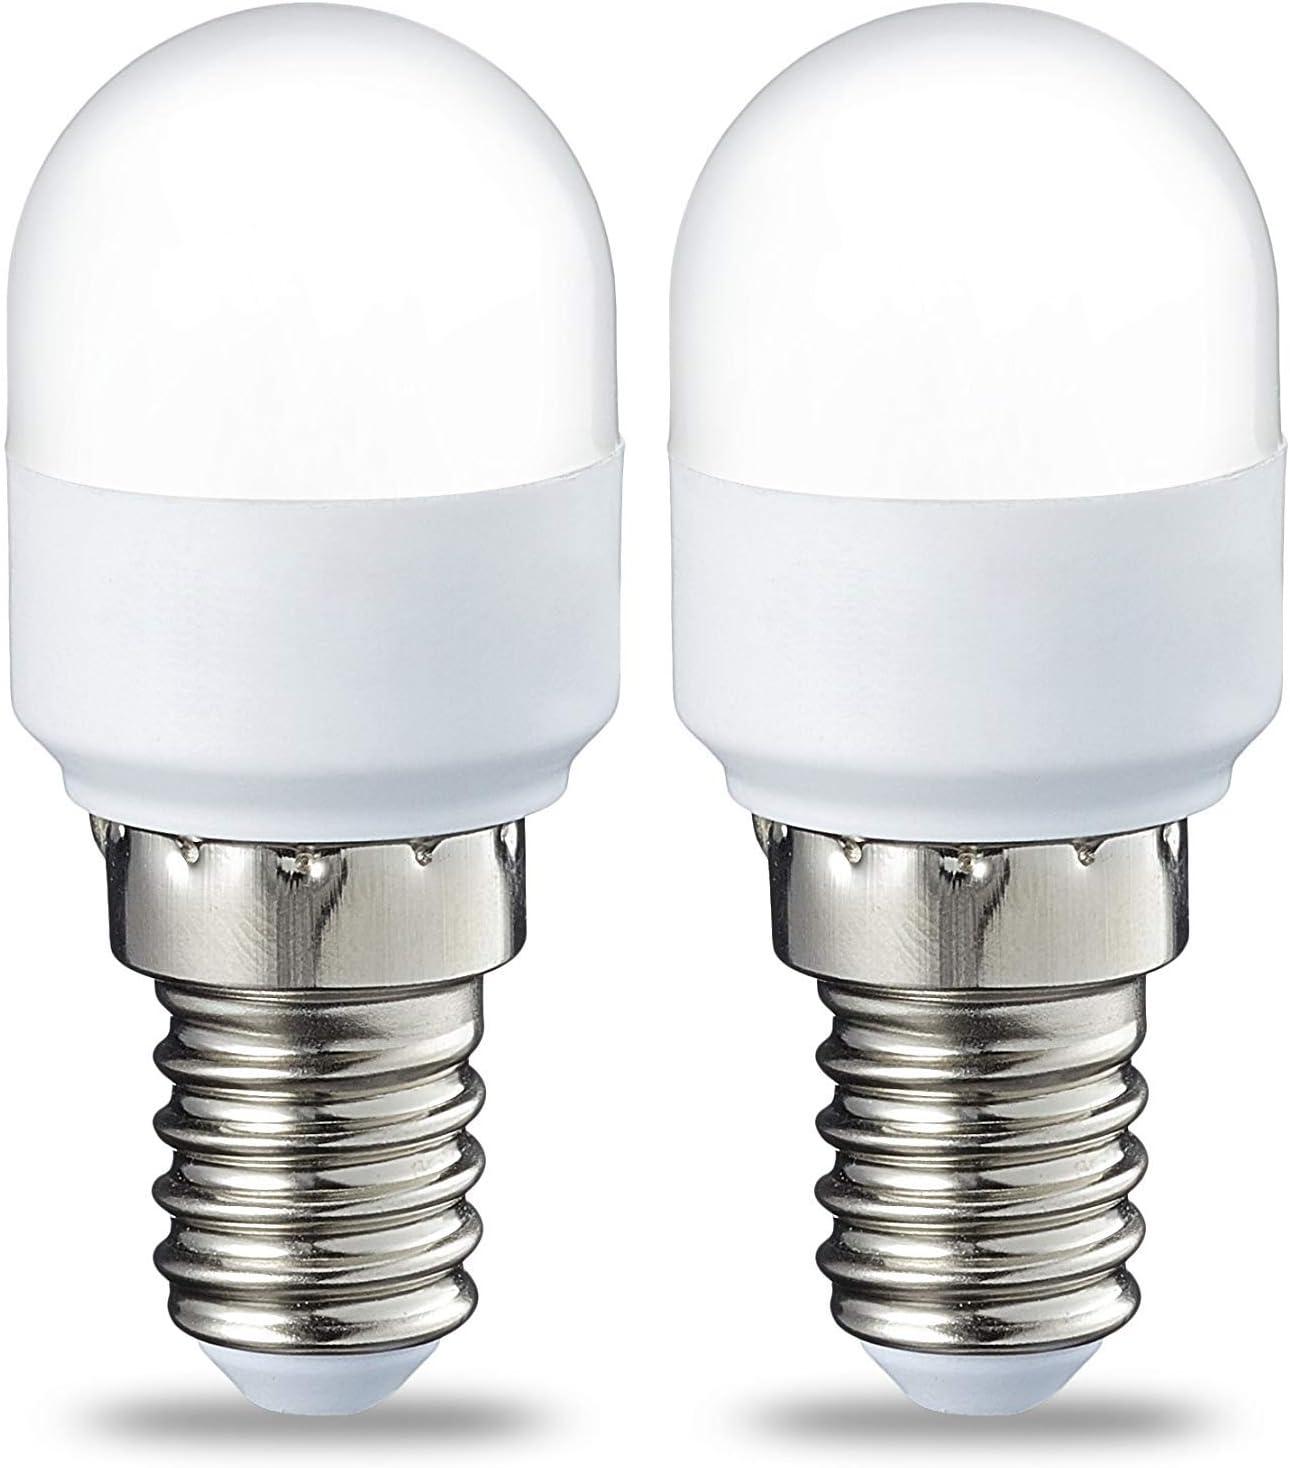 AmazonBasics Bombilla LED T25 E14, 1.8W (equivalente a 15W), Blanco Cálido, 2 unidades